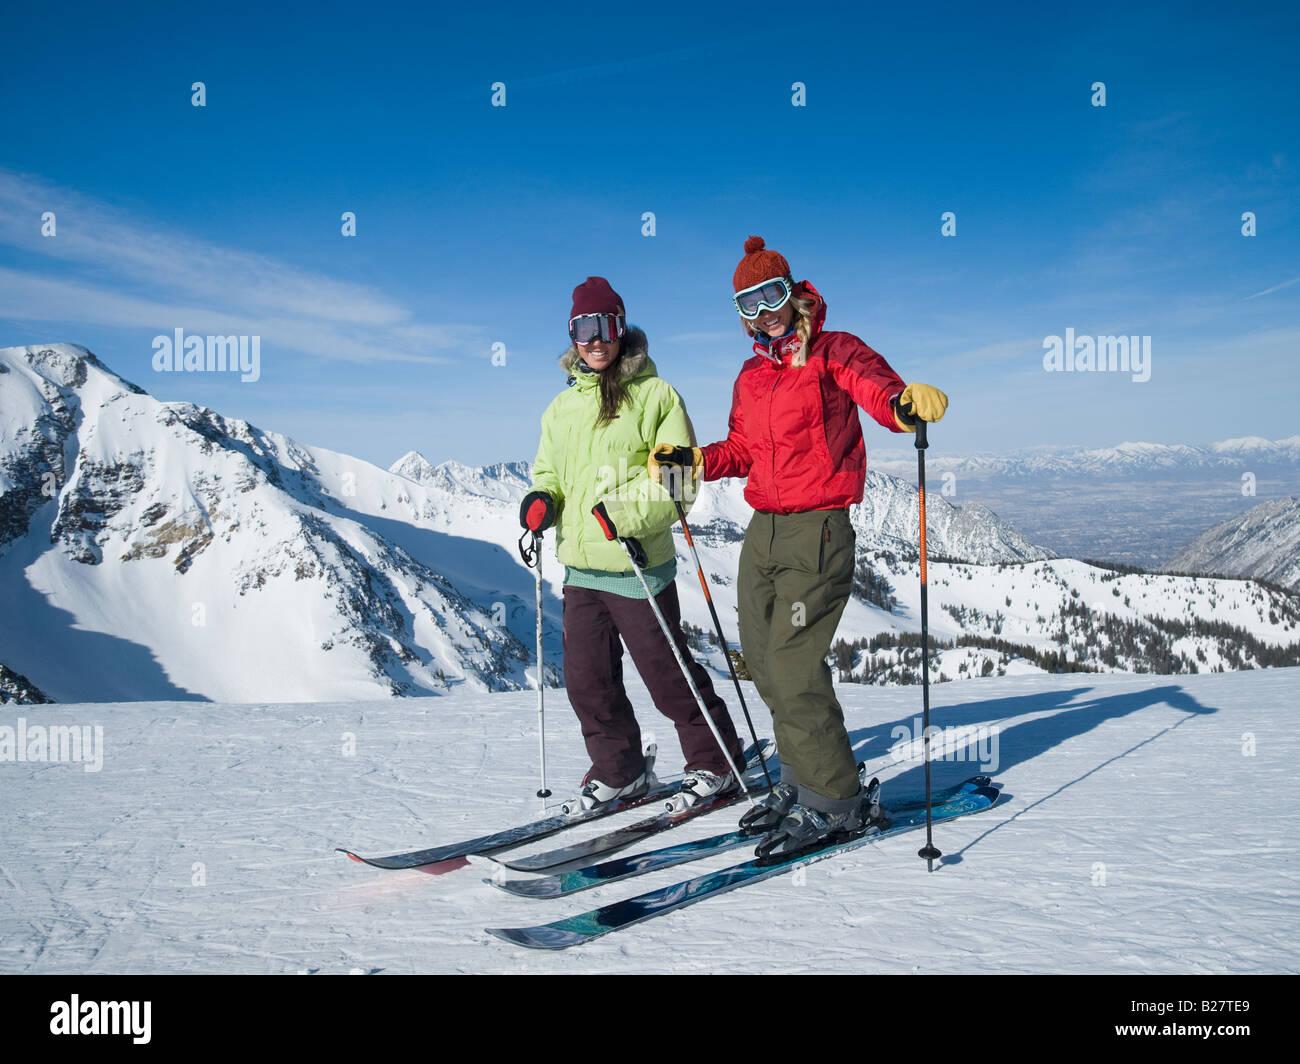 Women standing on skis, Wasatch Mountains, Utah, United States - Stock Image